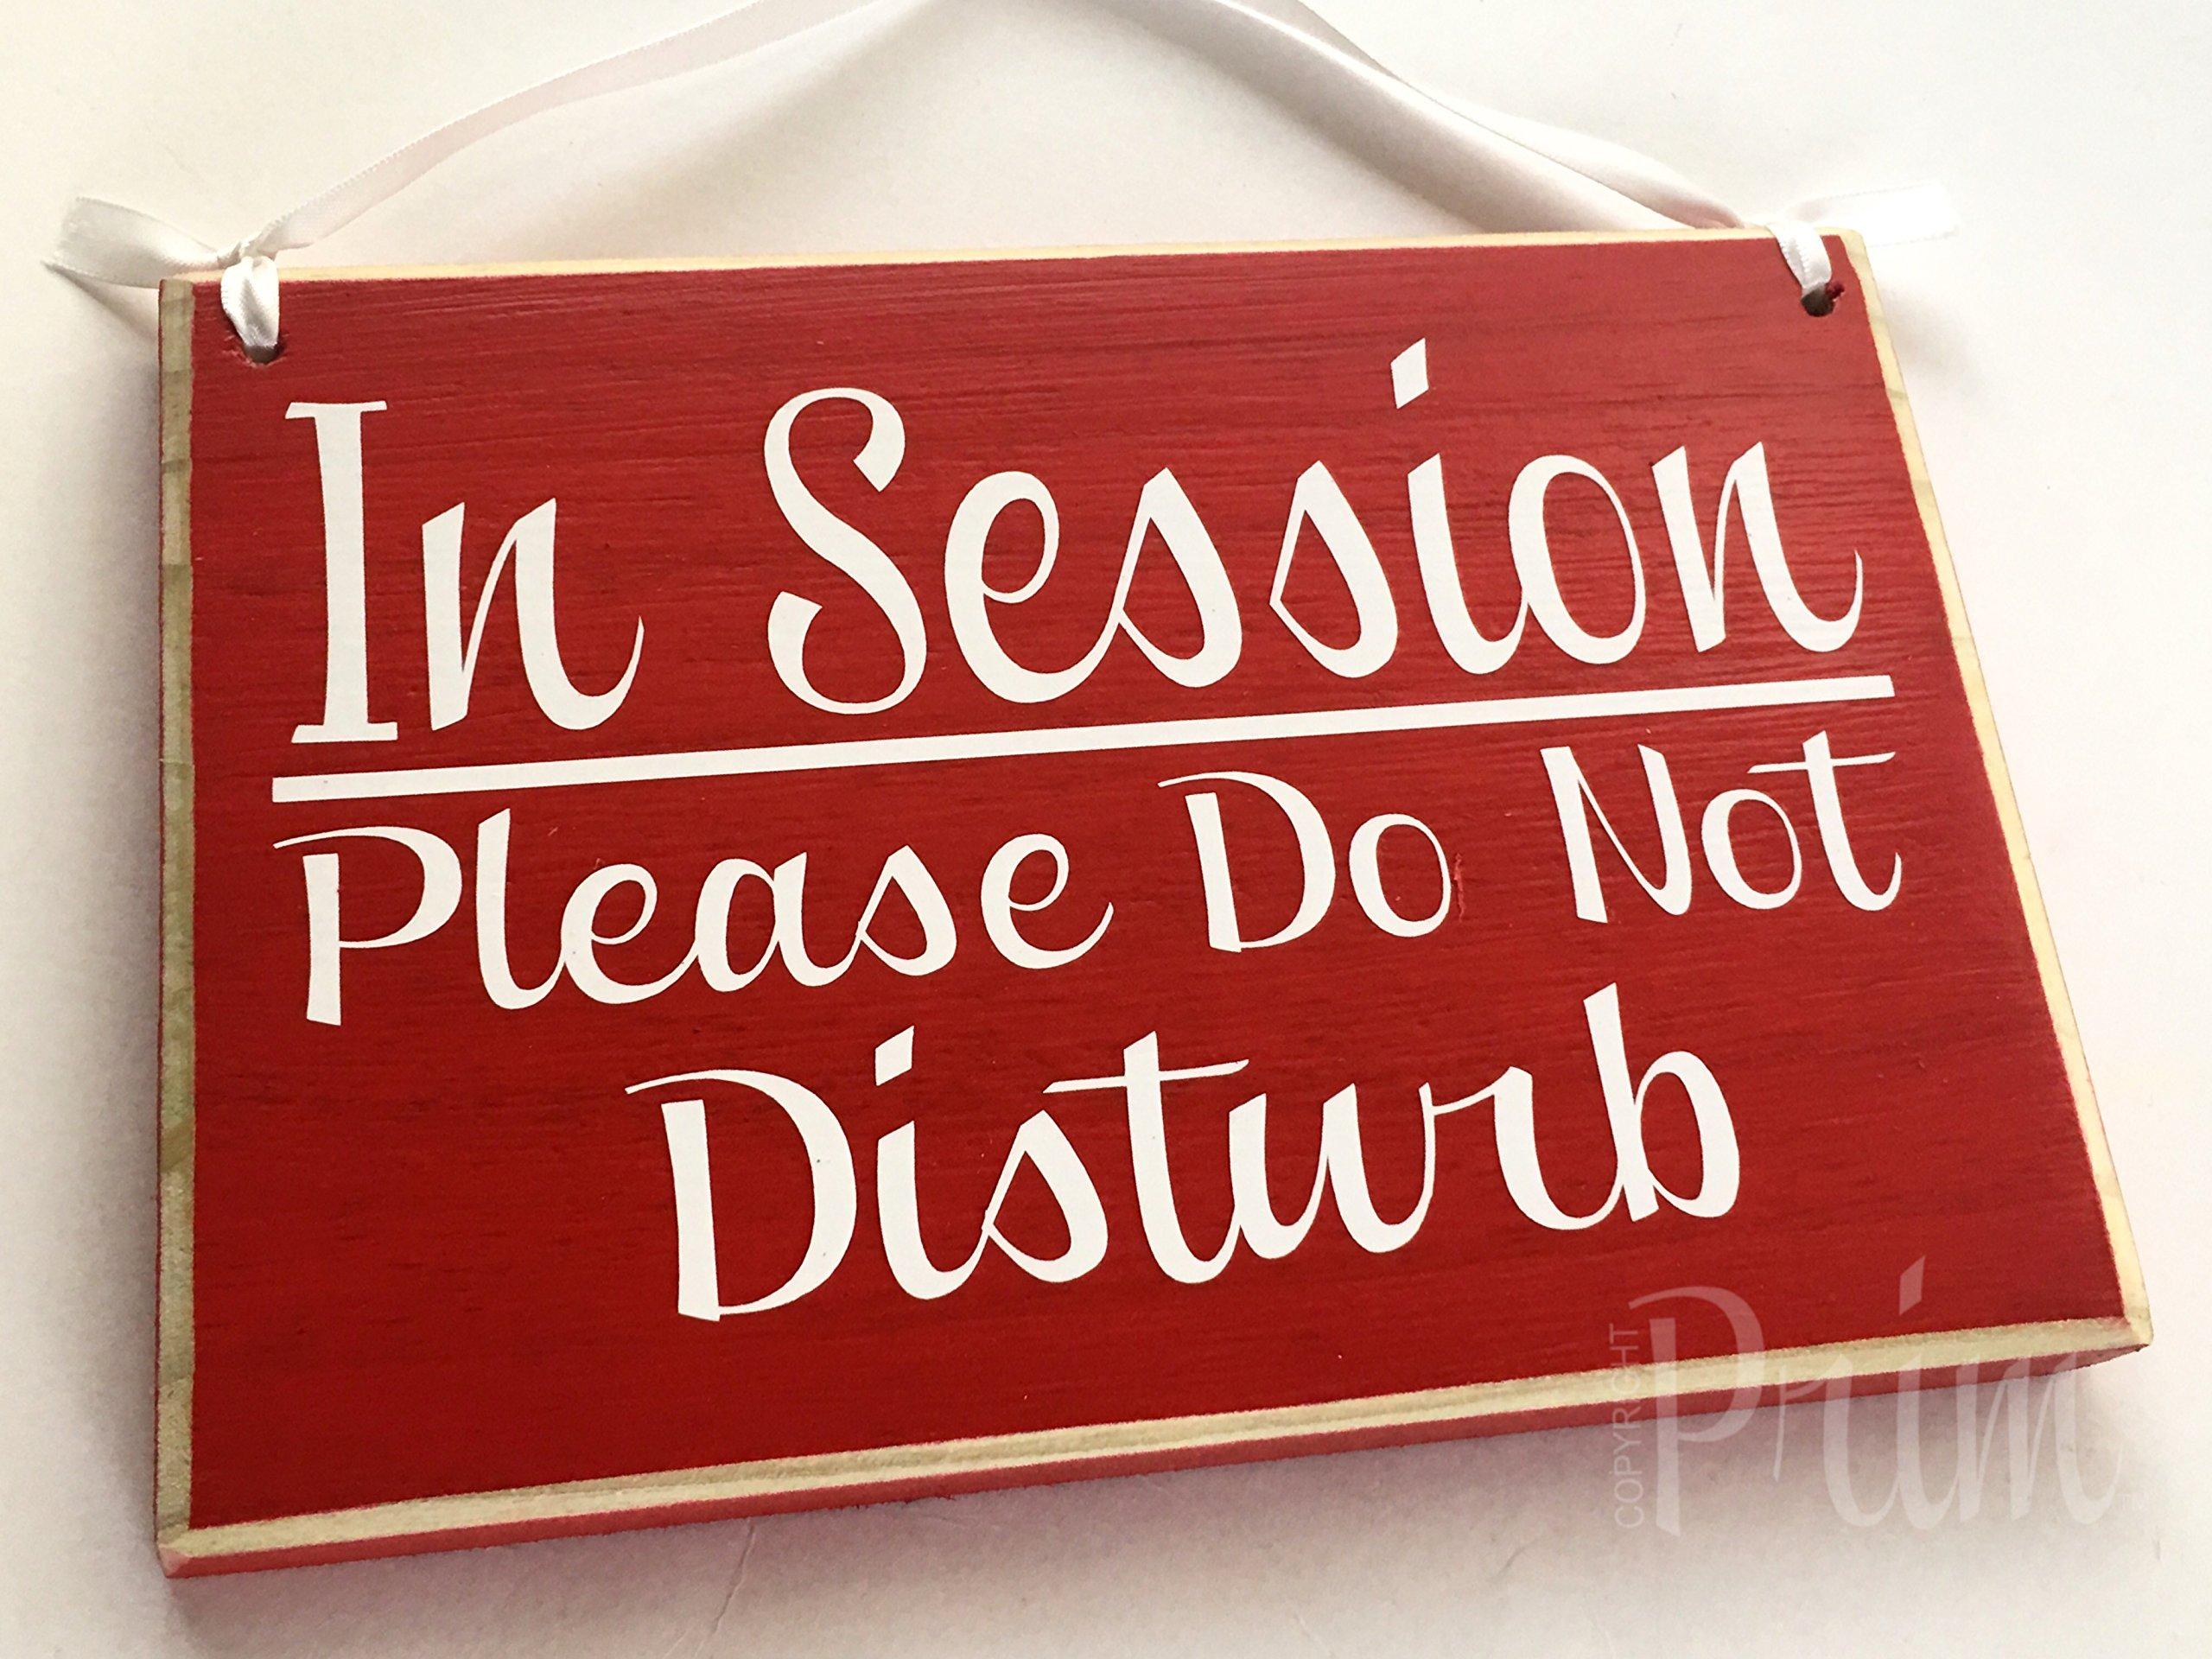 Prim and Proper Decor In Session Please Do Not Disturb 8x6 (Choose Color) In Progress Shhh Quiet Please Soft Voices Spa Salon Massage Facial Consultation Service Custom Wood Sign